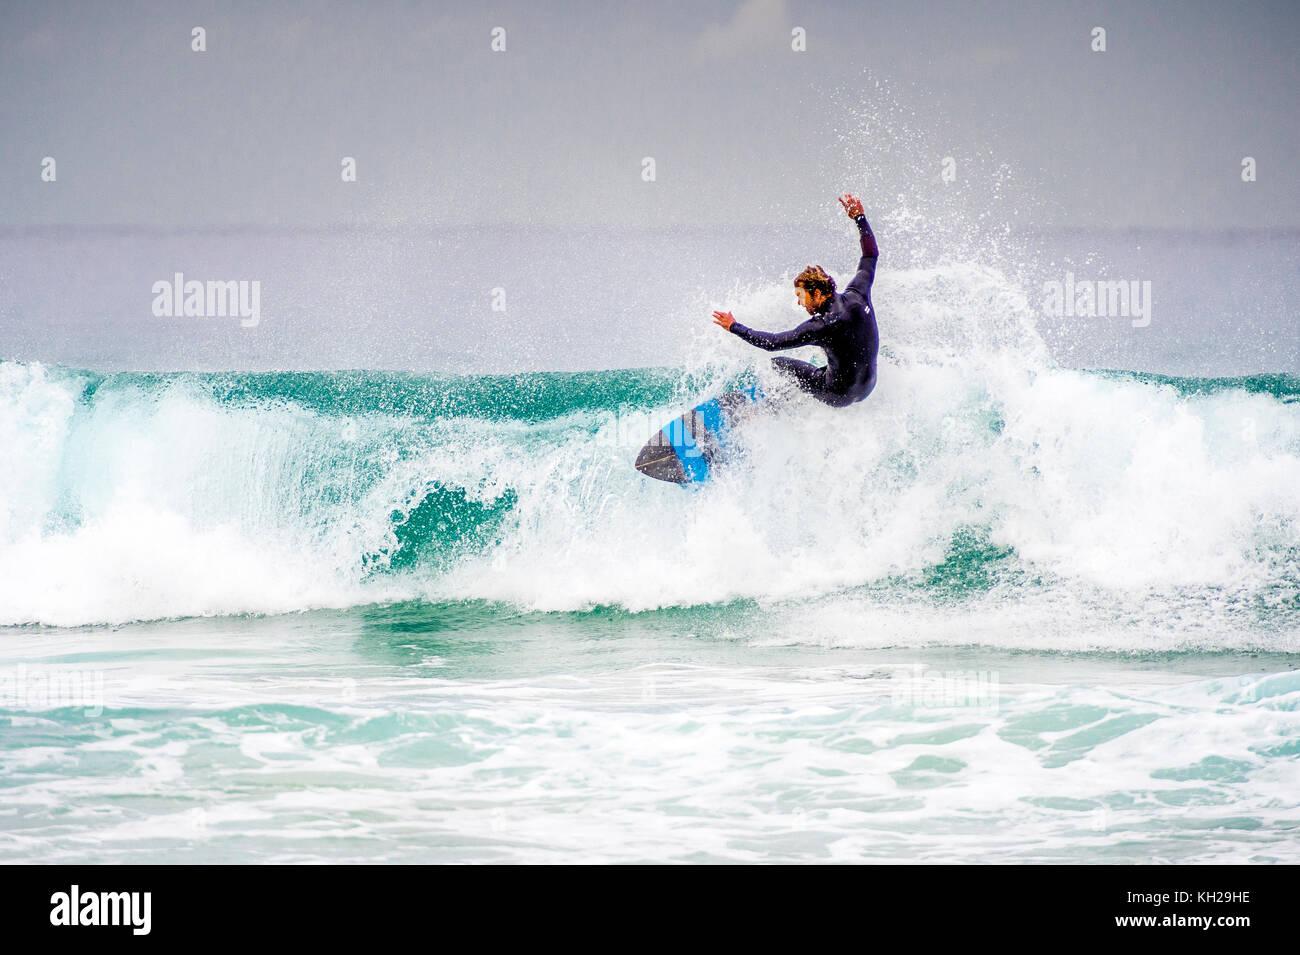 Surfing at Bondi Beach - Stock Image